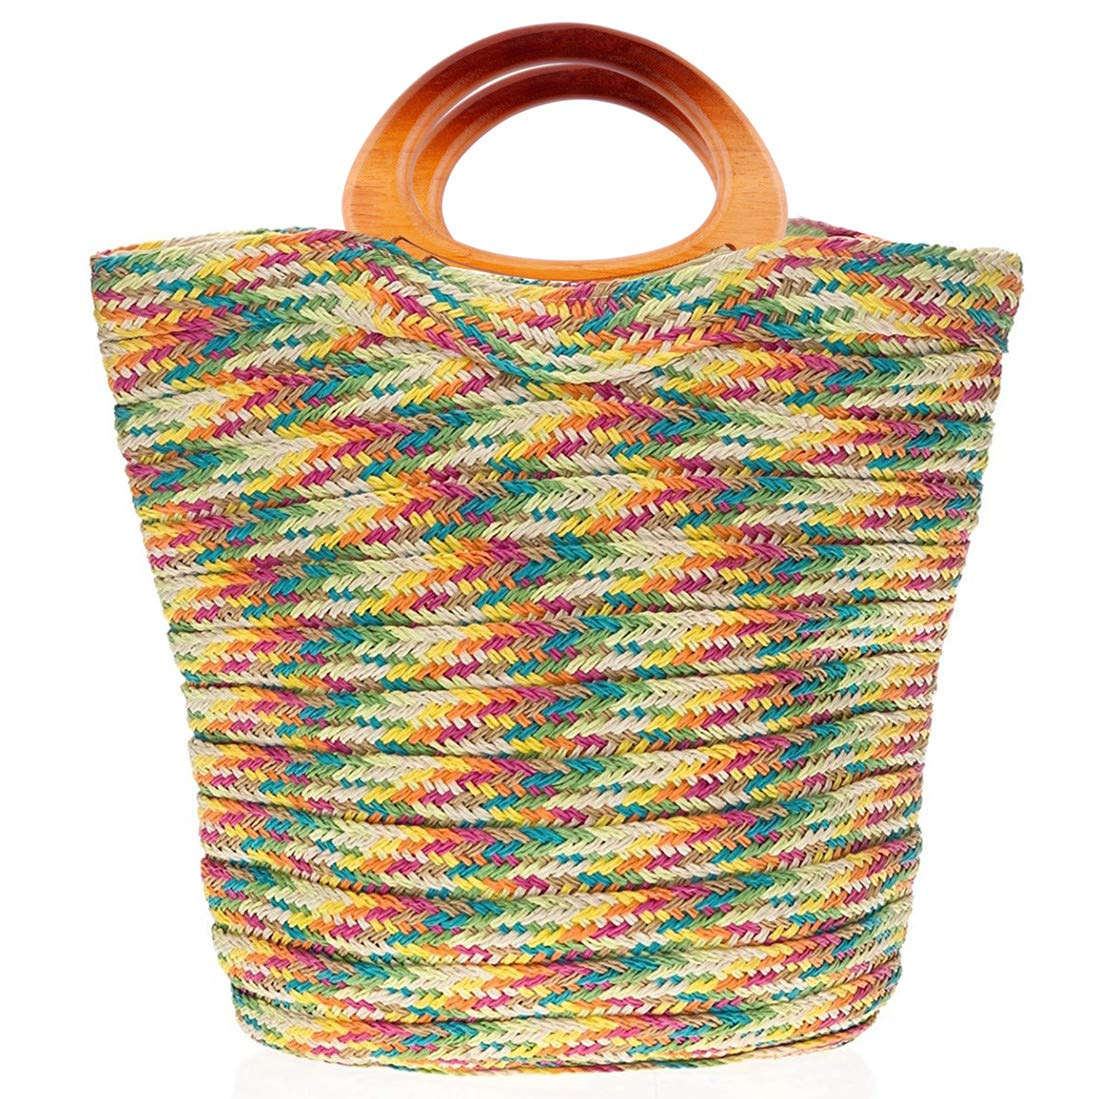 4Pcs Wooden Oval Shaped Handles Replacement for Handmade Bag Beach Bag Handbags Straw Bag Purse Handles